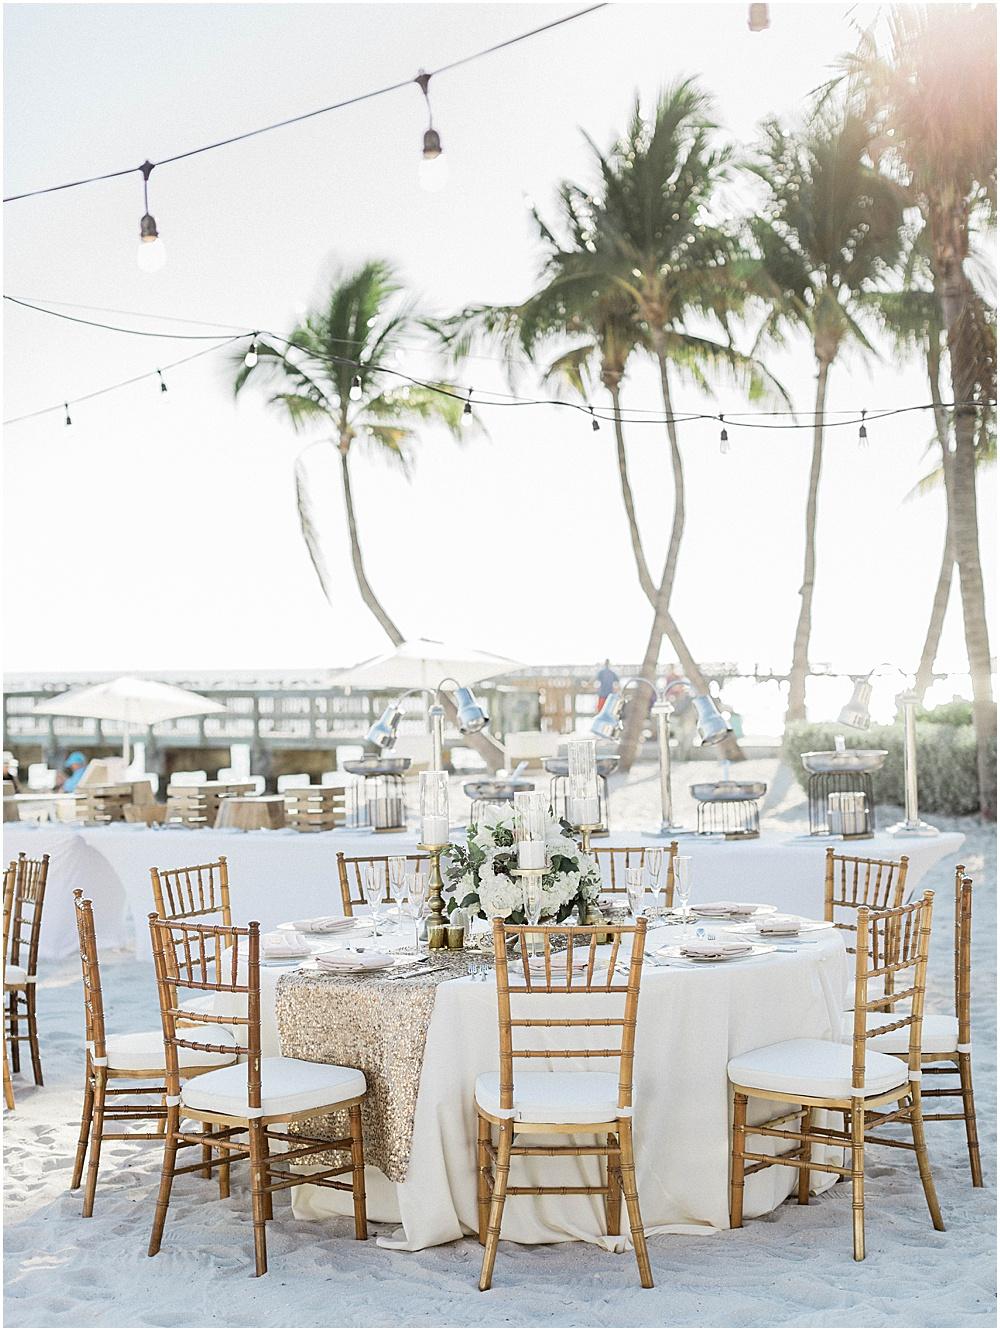 casa_marina_key_west_florida_destination_palm_trees_boston_wedding_photographer_meredith_jane_photography_photo_0101.jpg